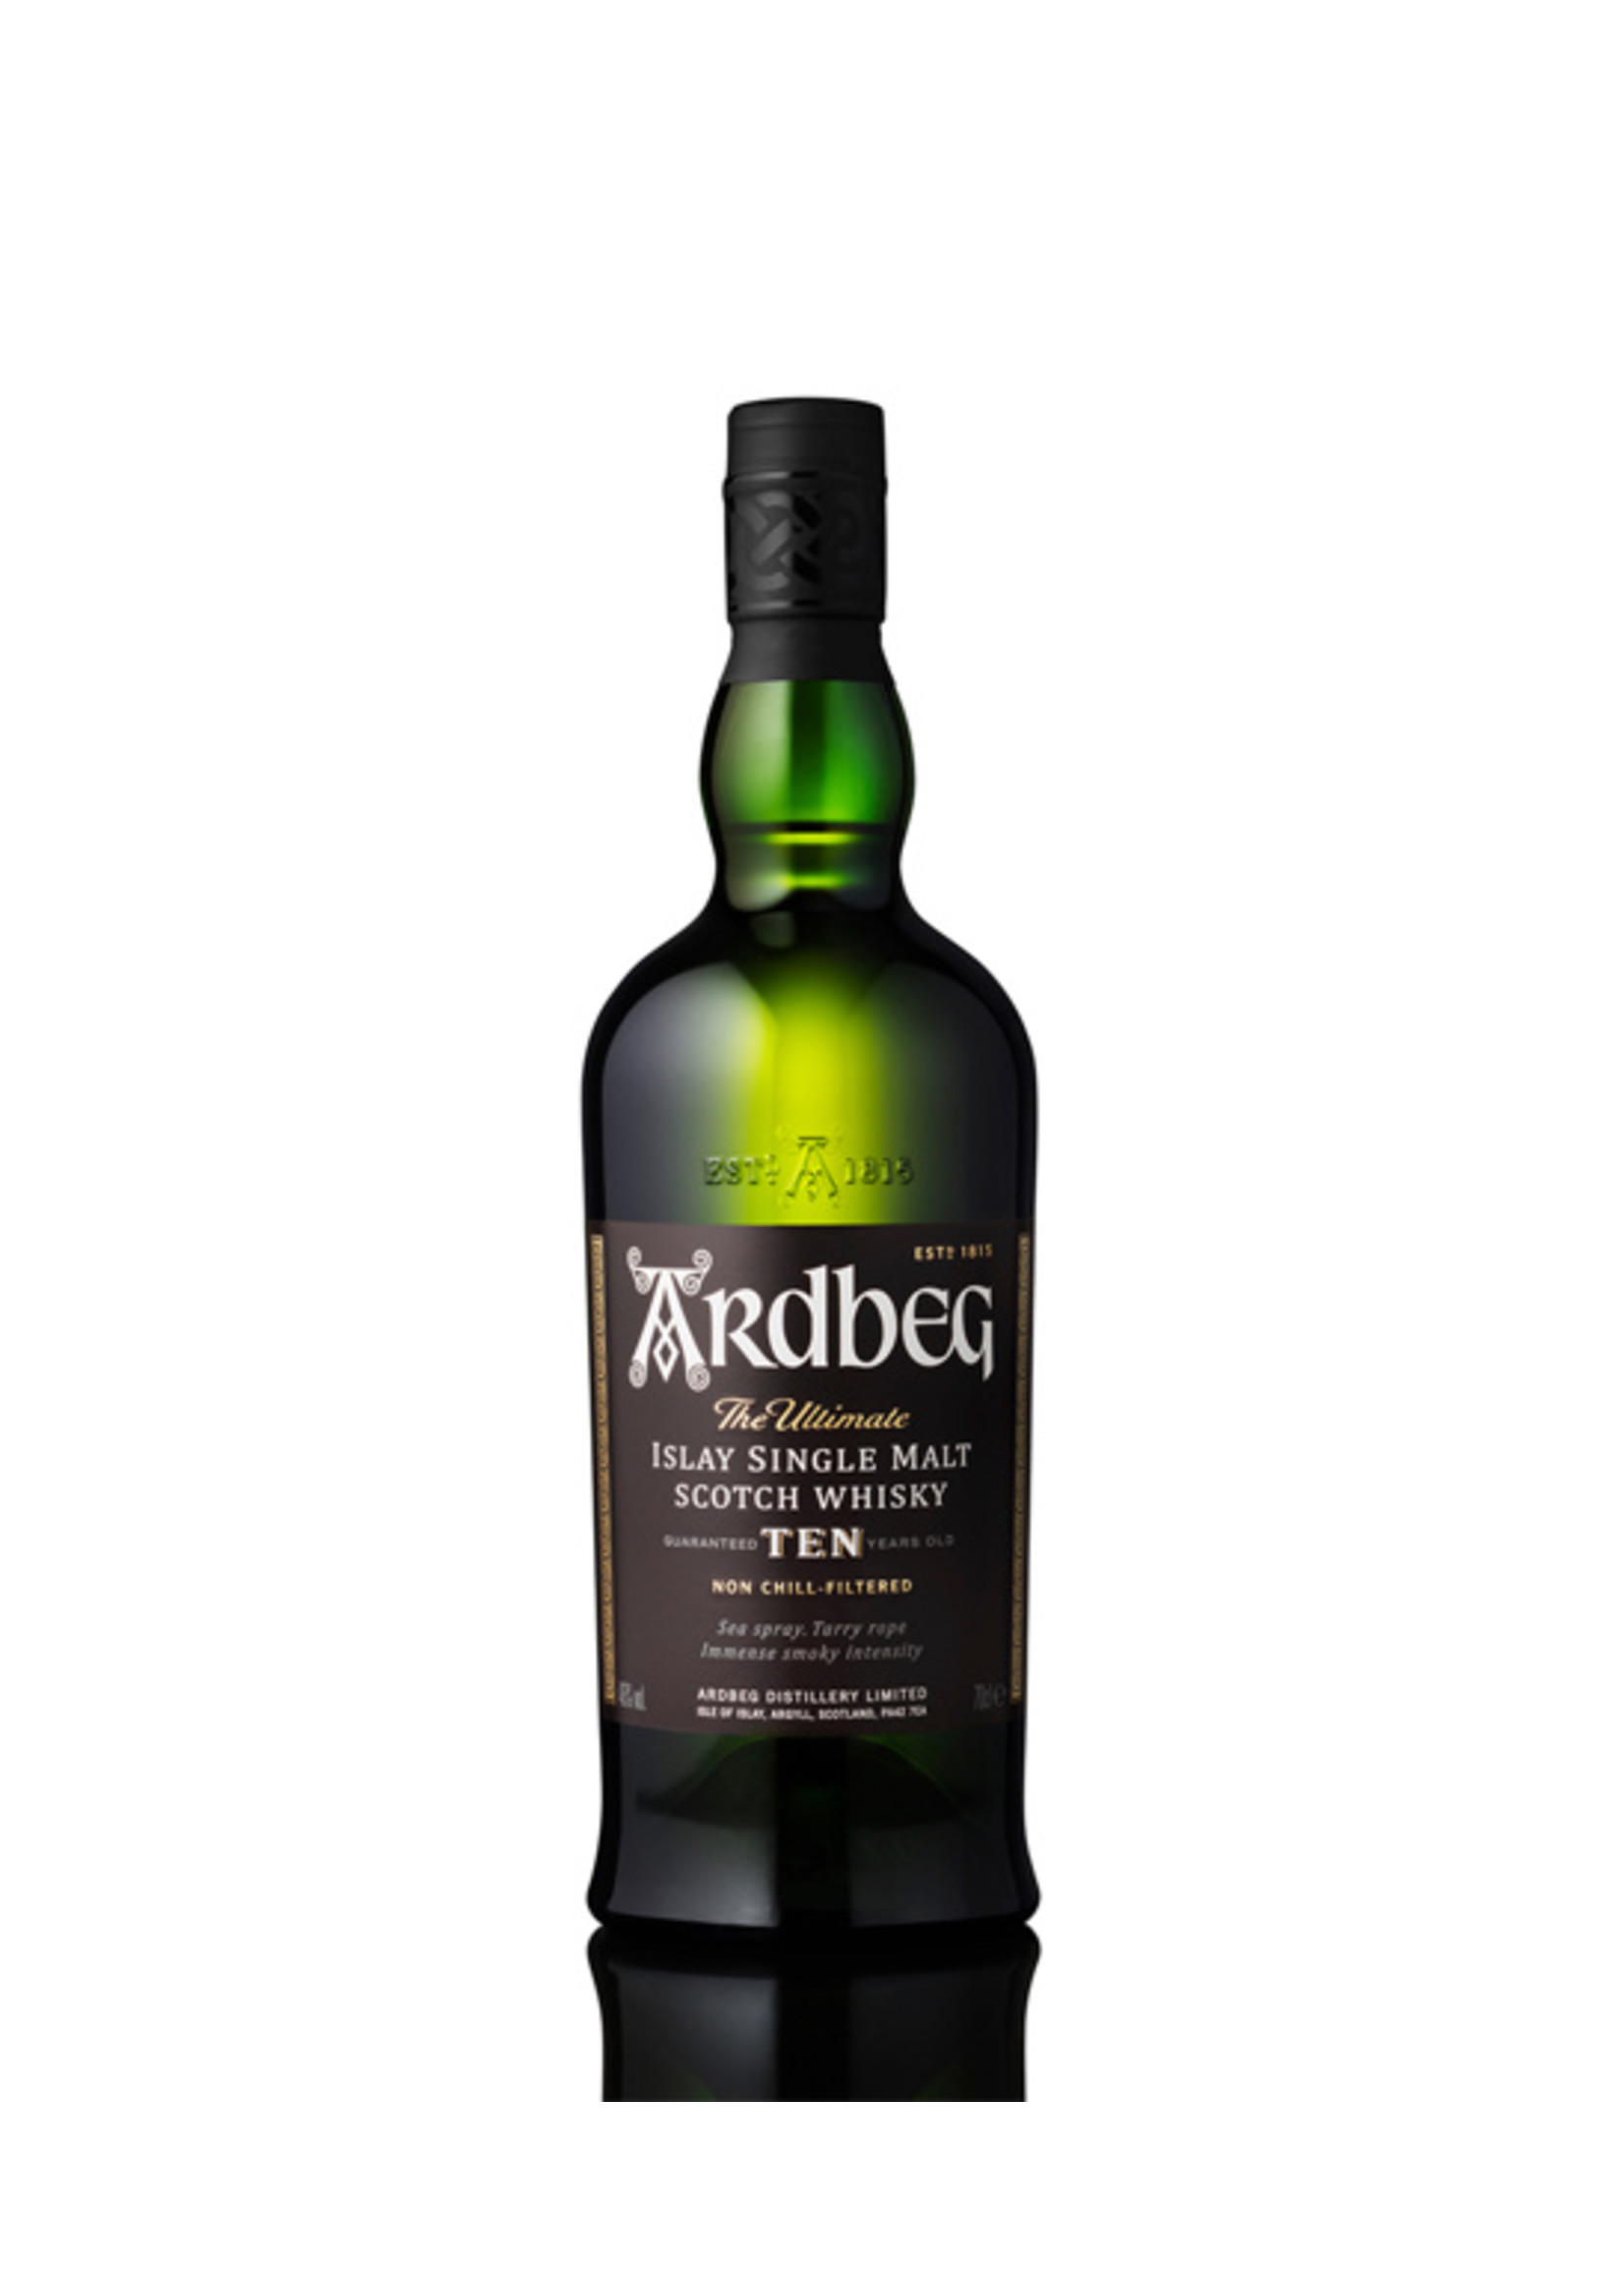 ARDBEG Ardbeg / 10 Year Single Malt / 750mL